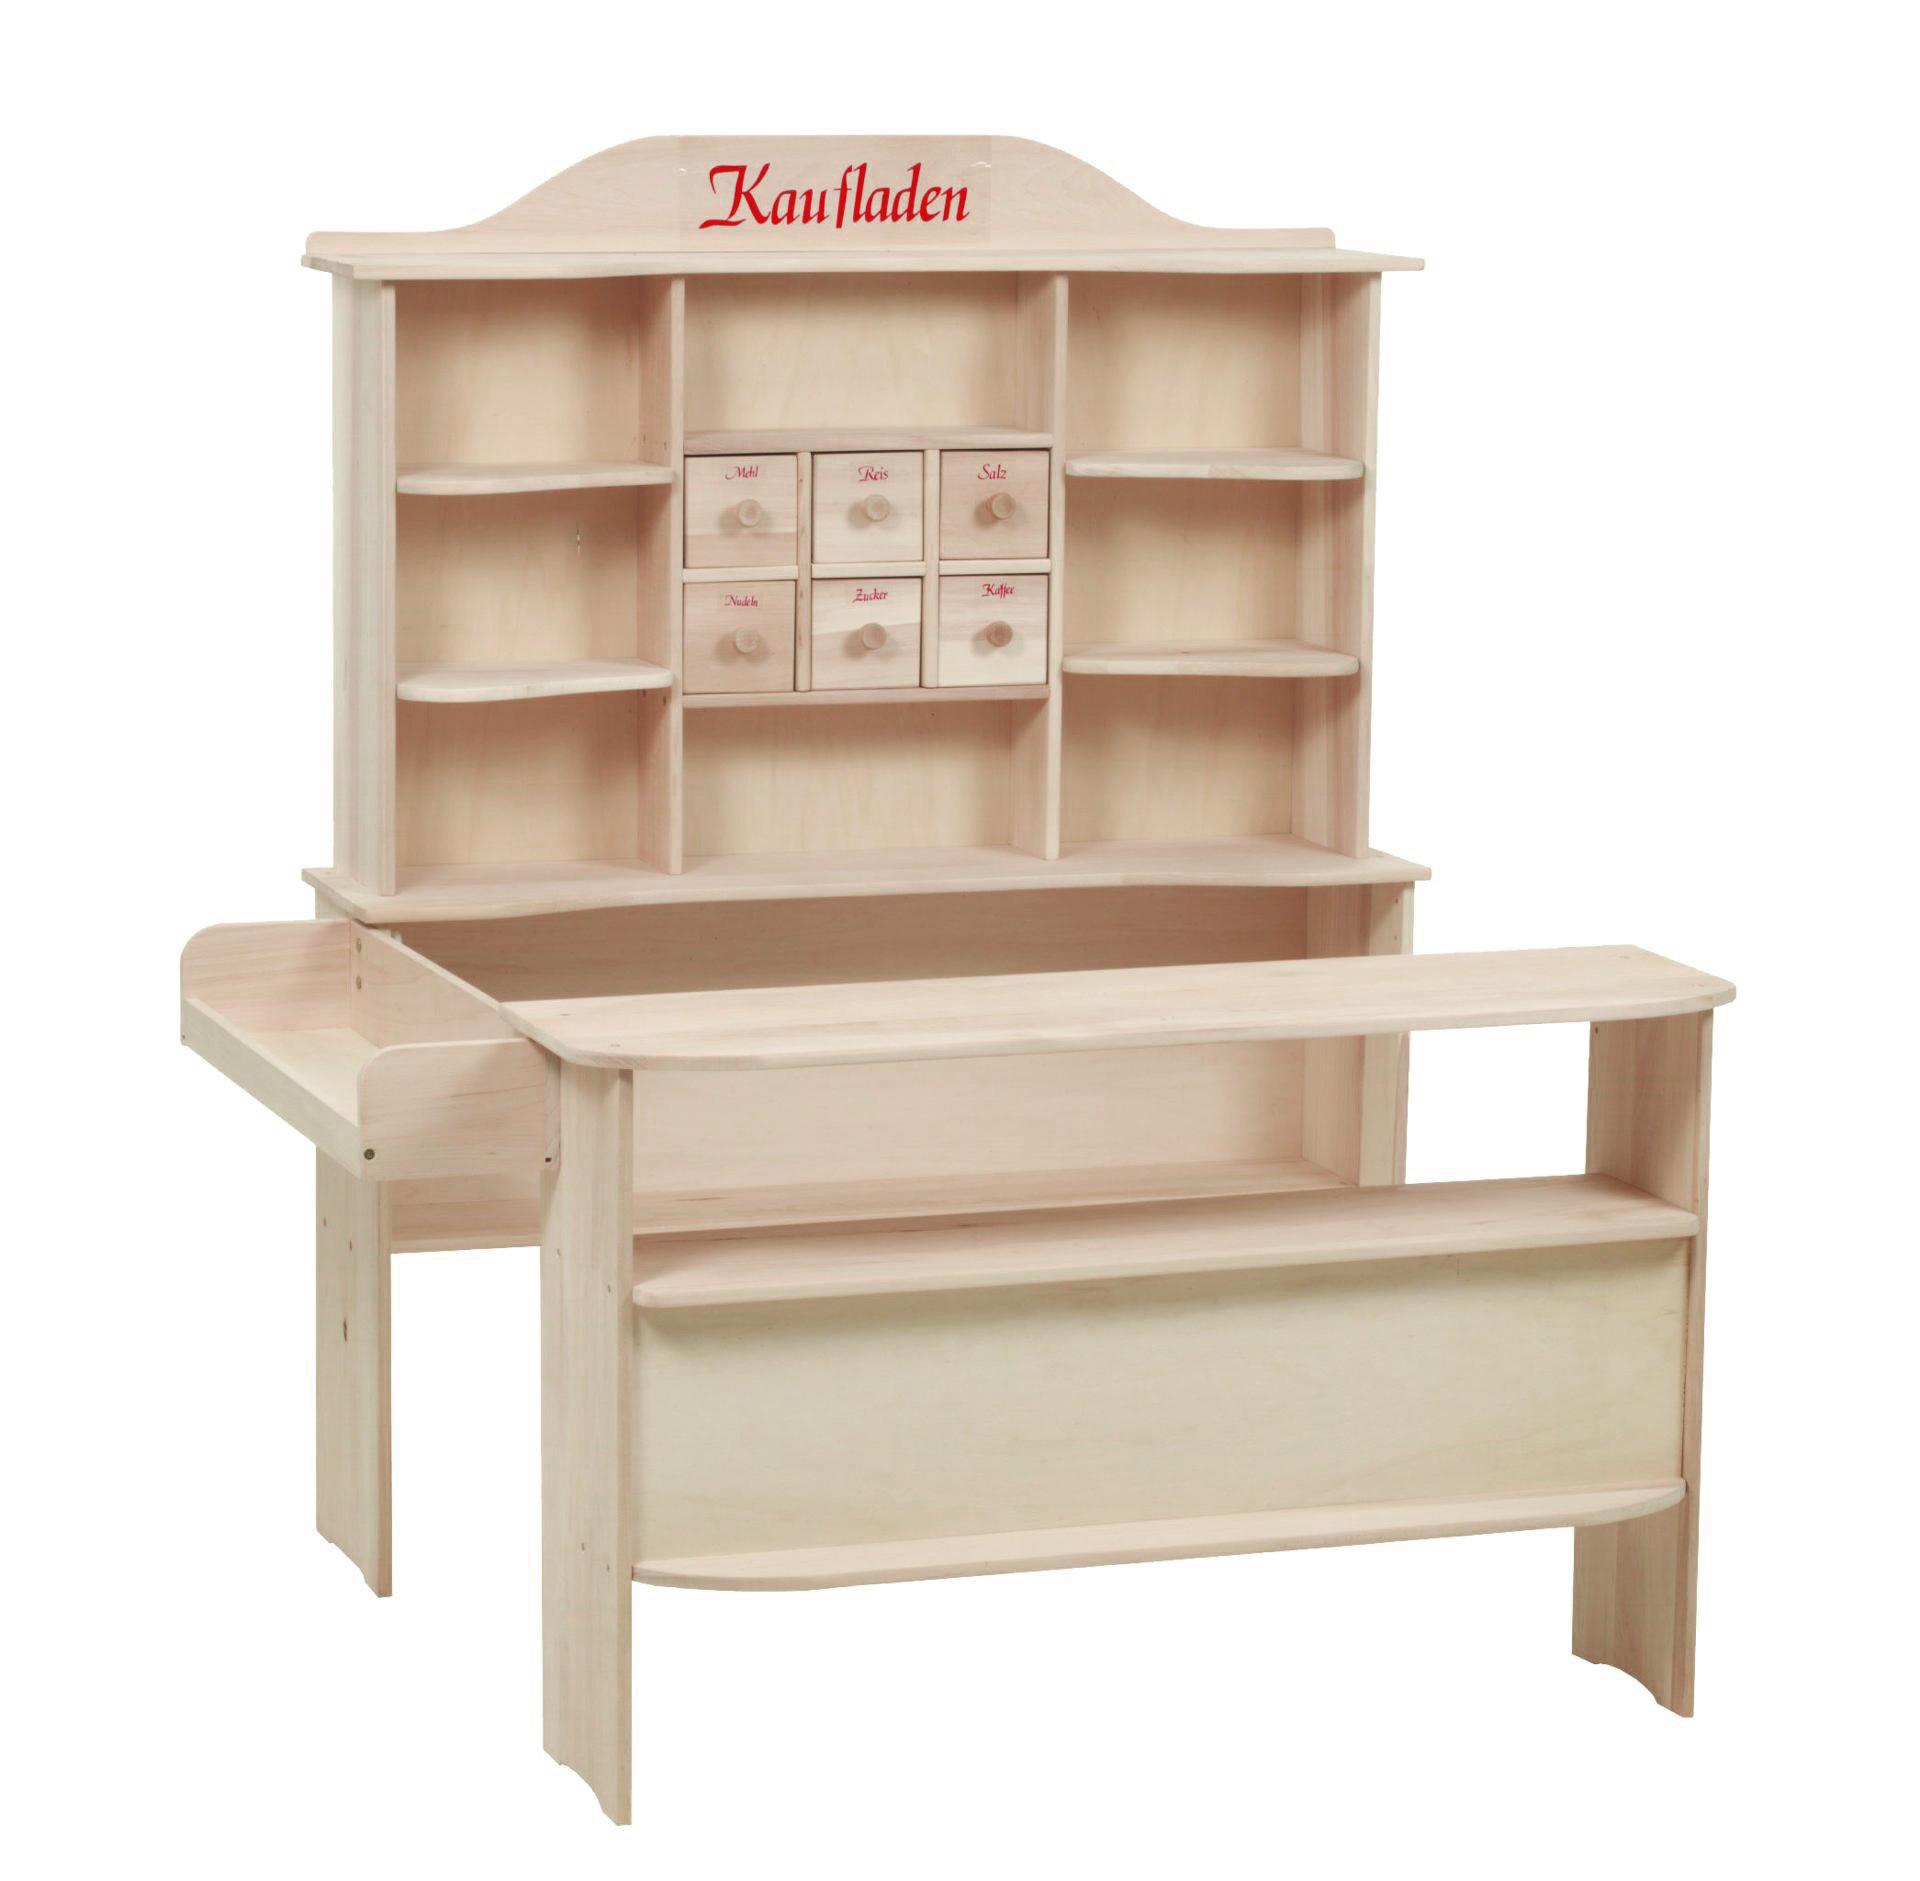 kinder kaufladen aus holz roba g nstig online kaufen. Black Bedroom Furniture Sets. Home Design Ideas